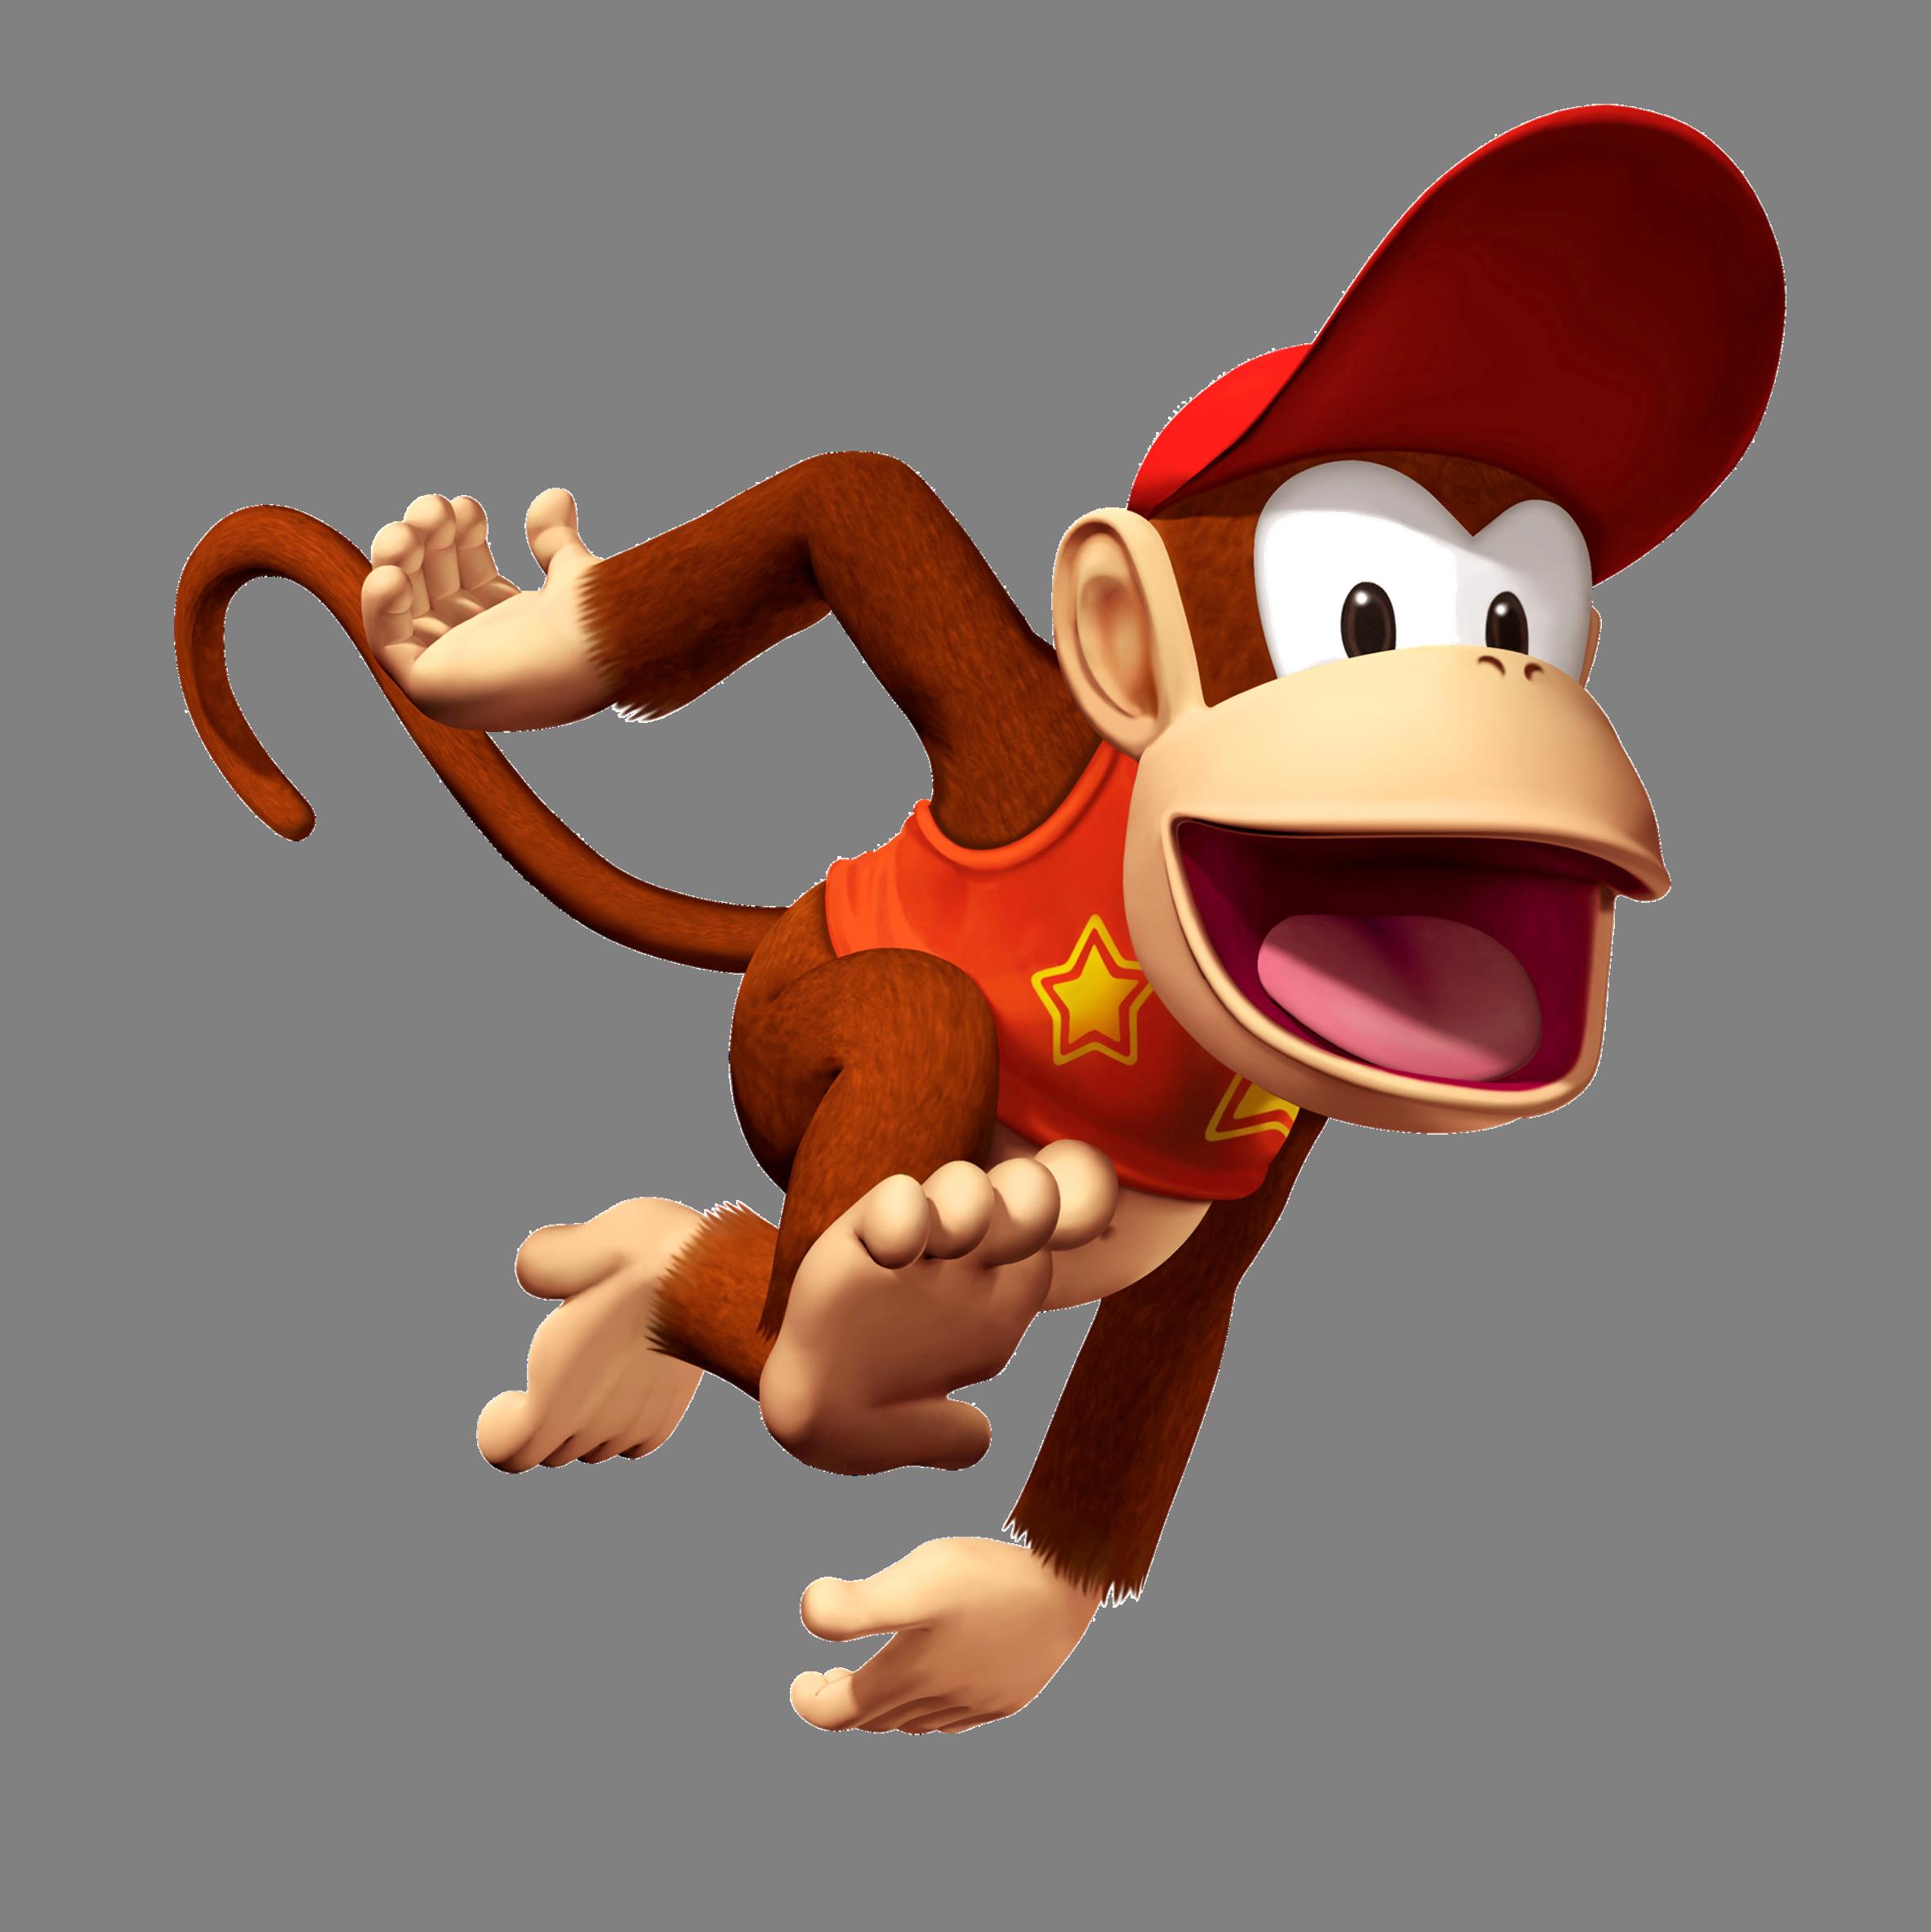 Donkey Kong PNG High Quality Image.